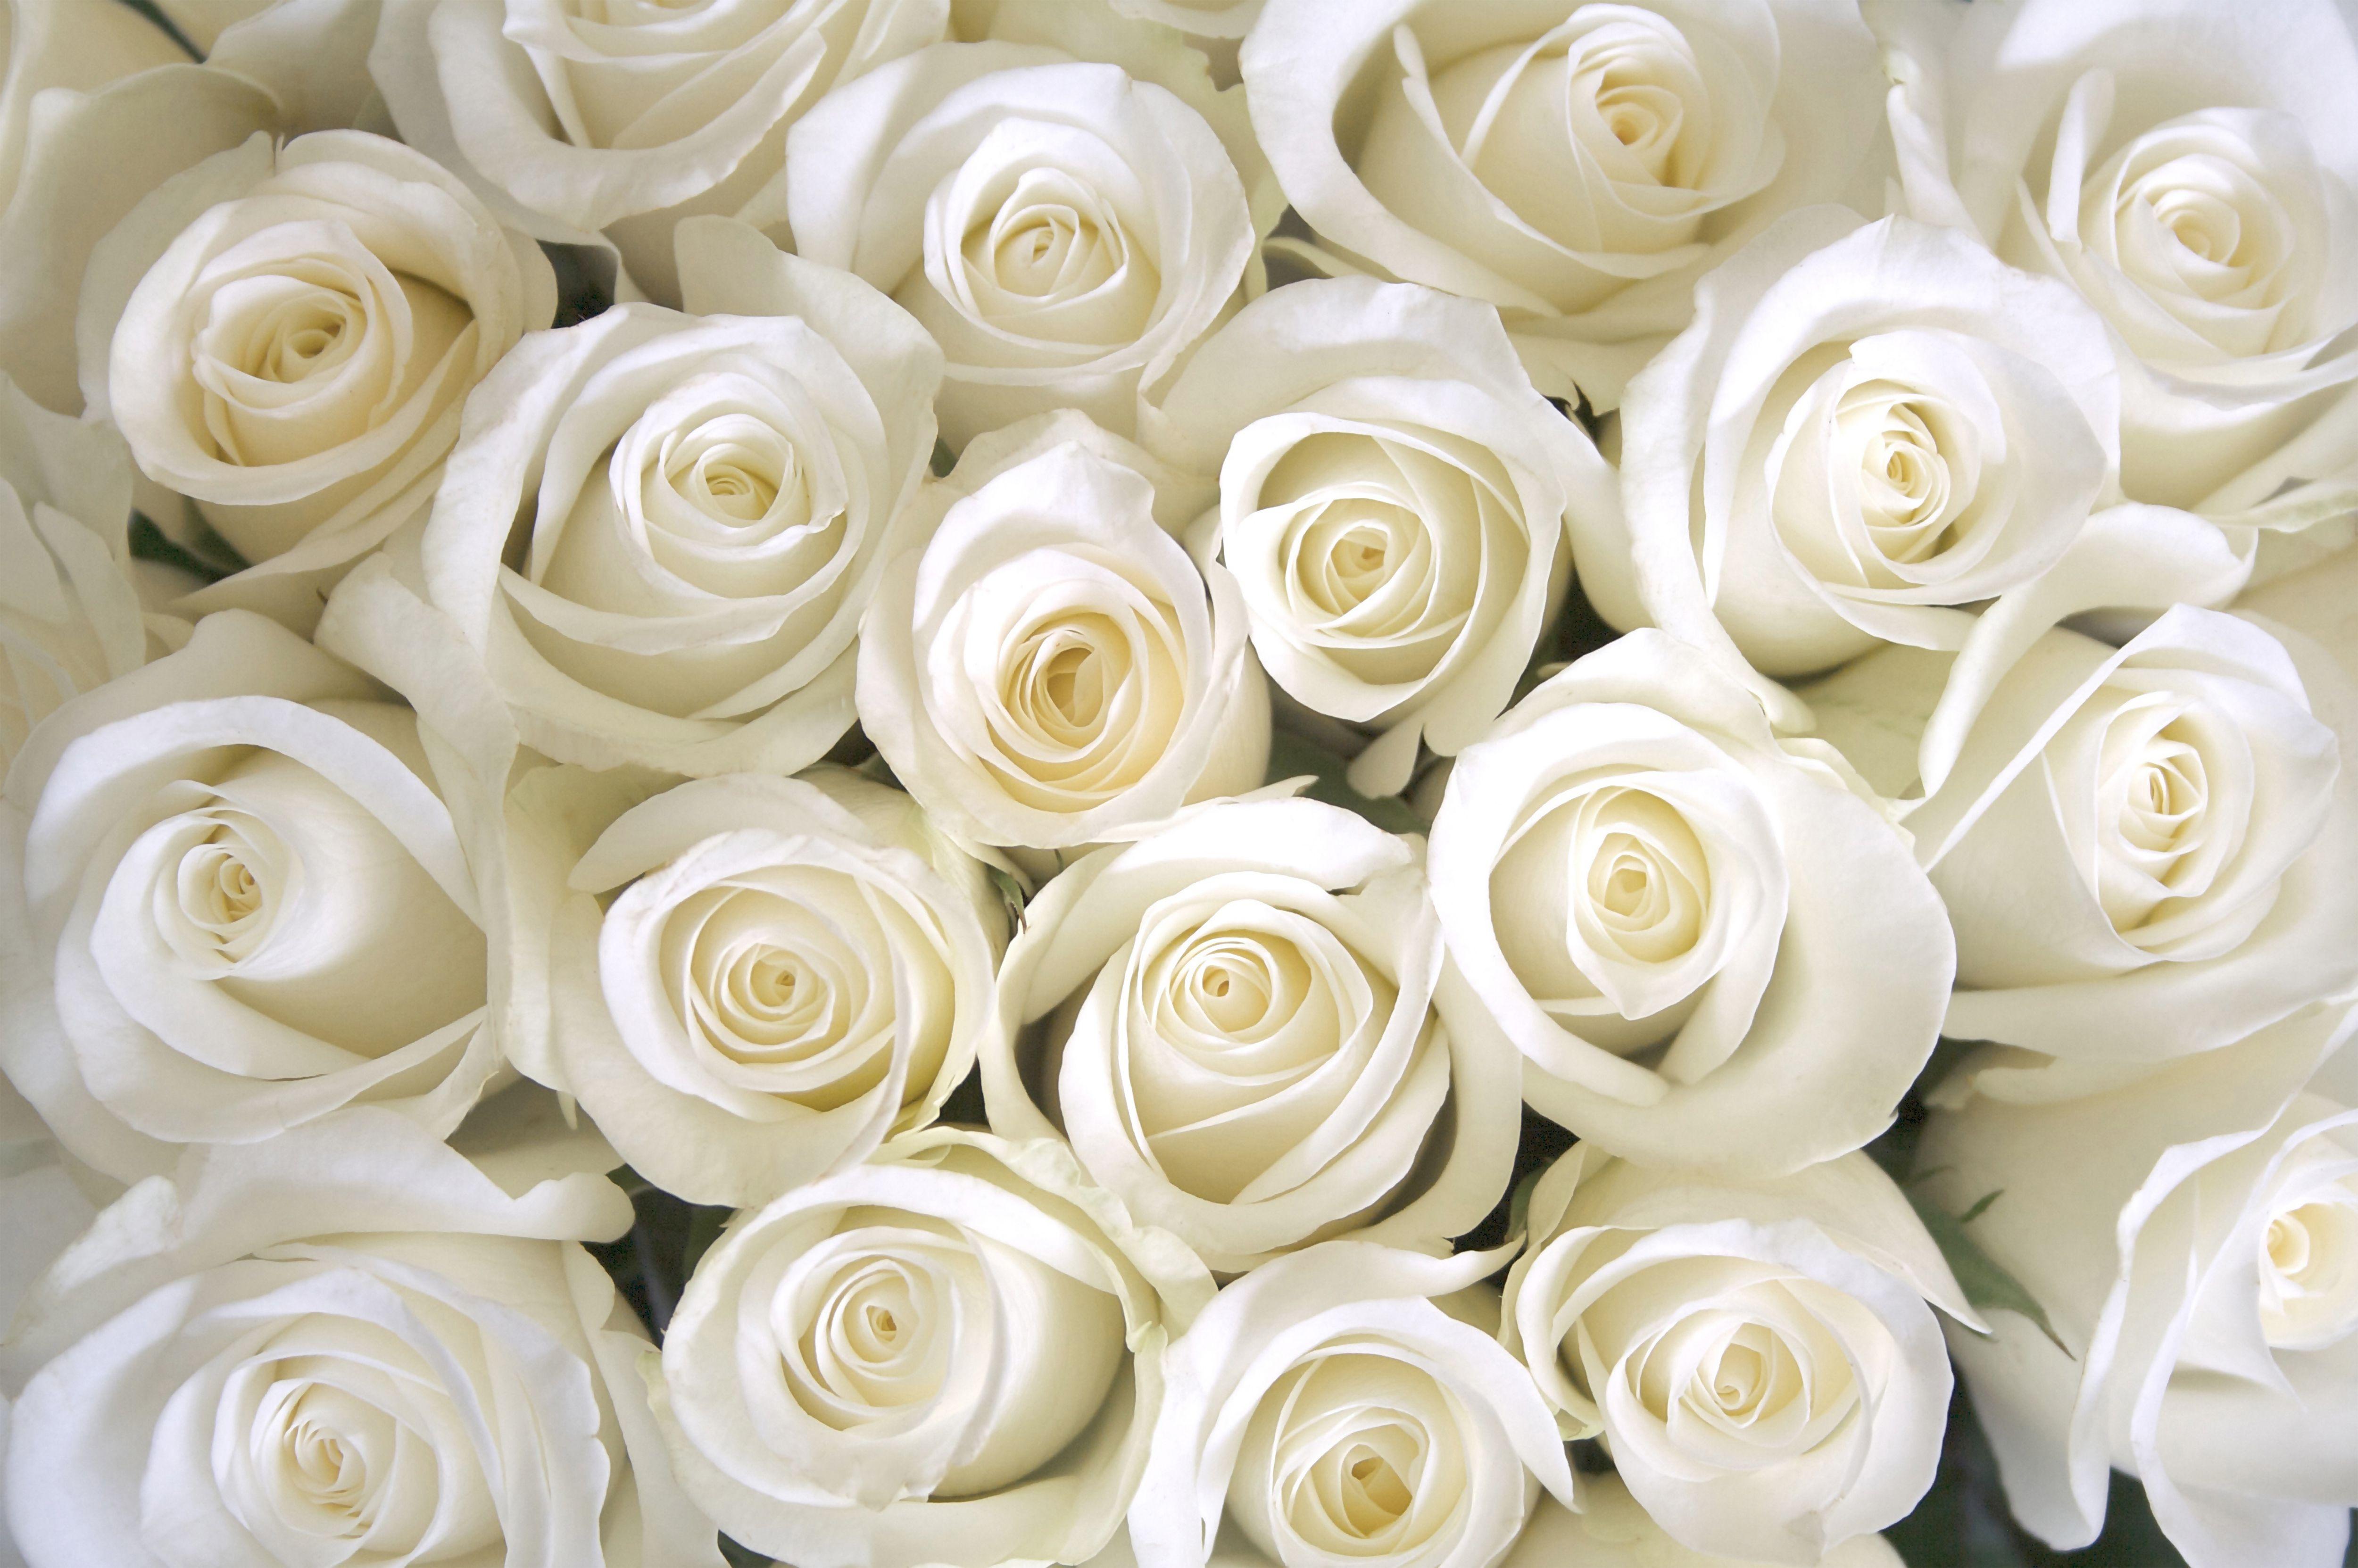 White Roses Background flower in 2019